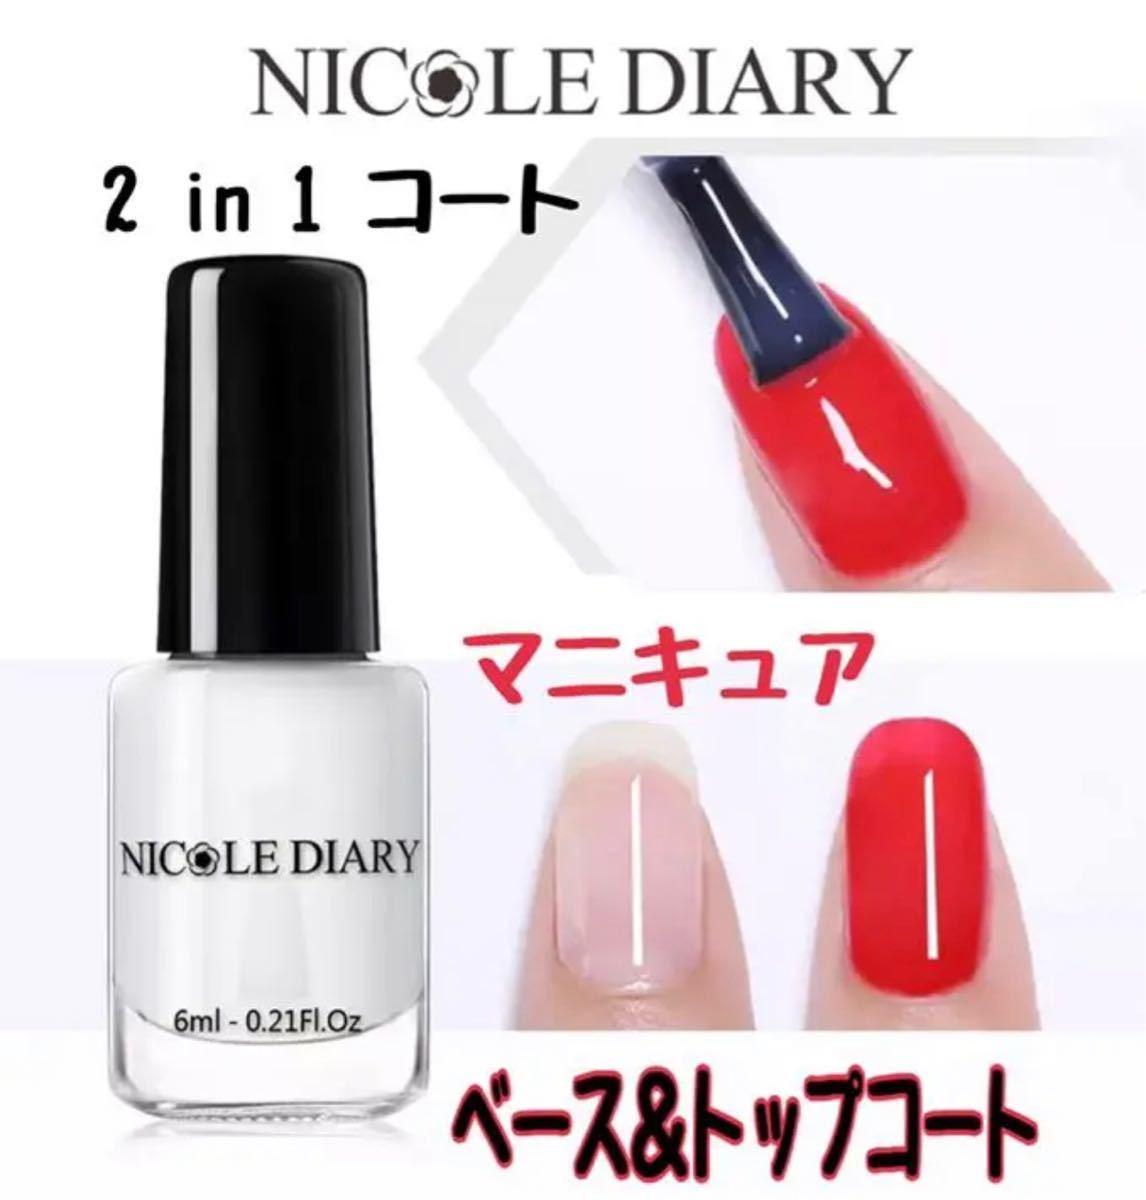 NICOLE DIARY  二役 2イン1 ベース&トップコート 6ml マニキュア